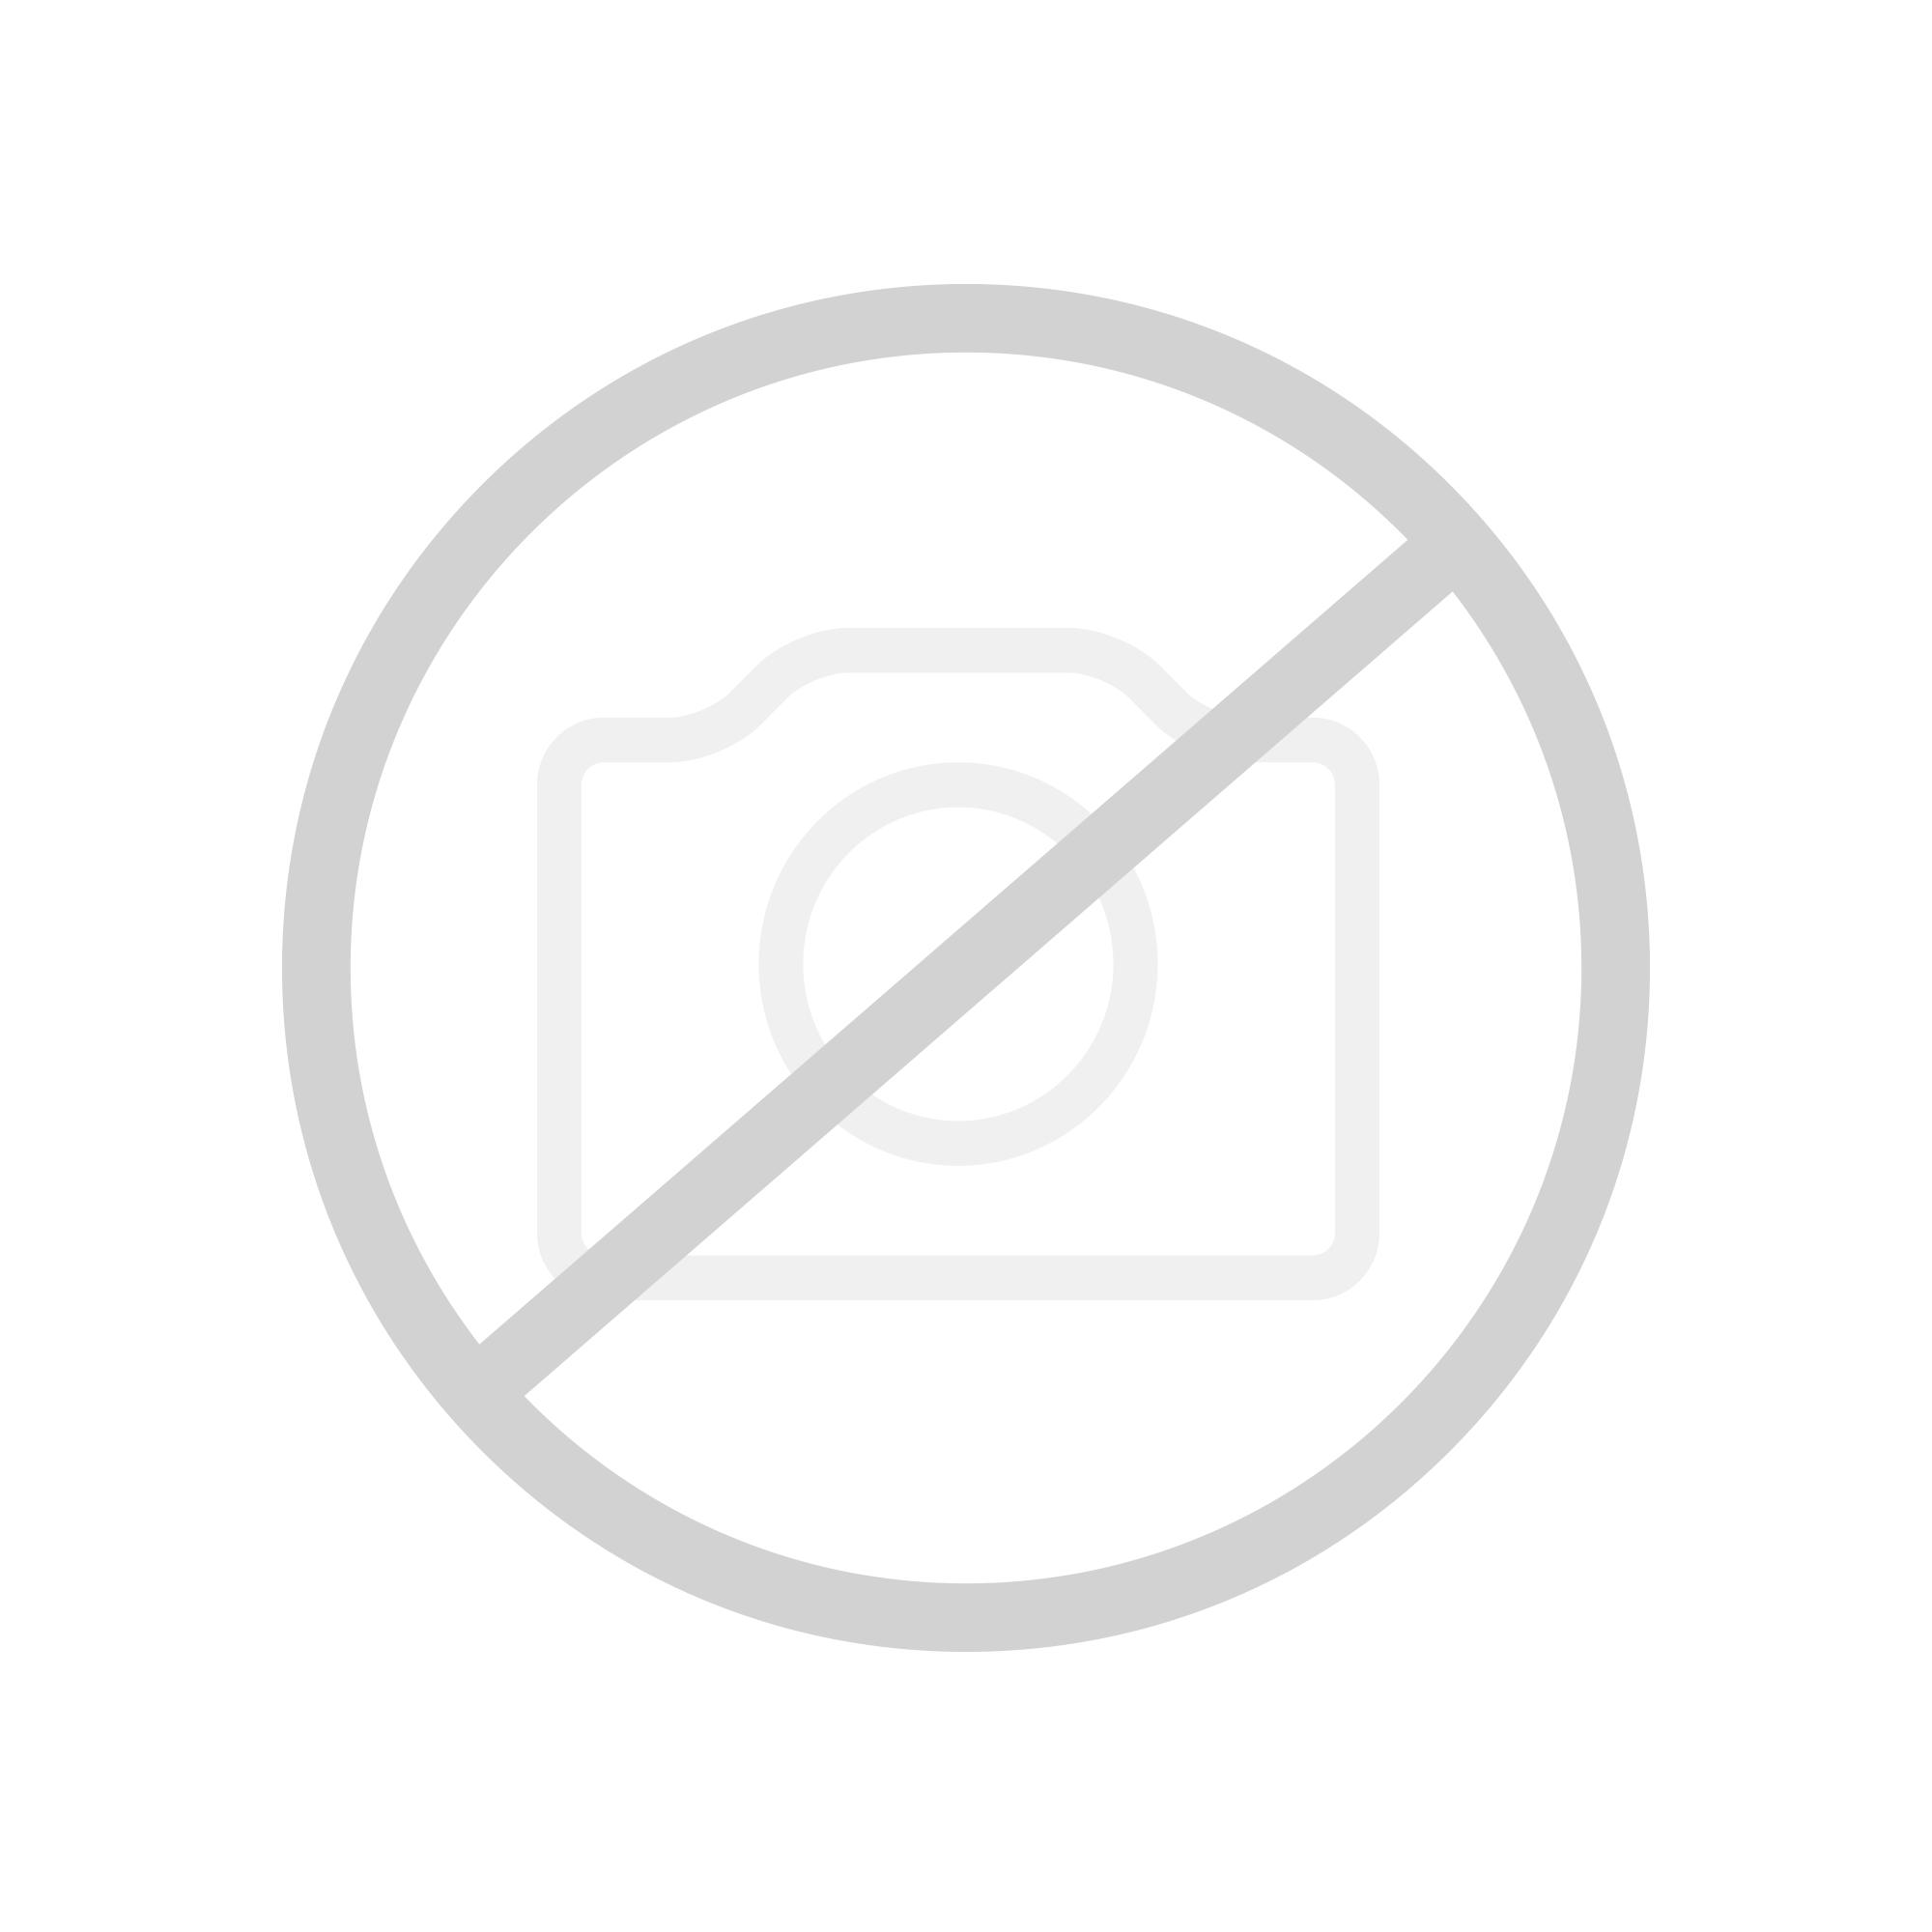 Grohe Armaturen online bestellen im REUTER Shop   {Grohe armaturen dusche 24}